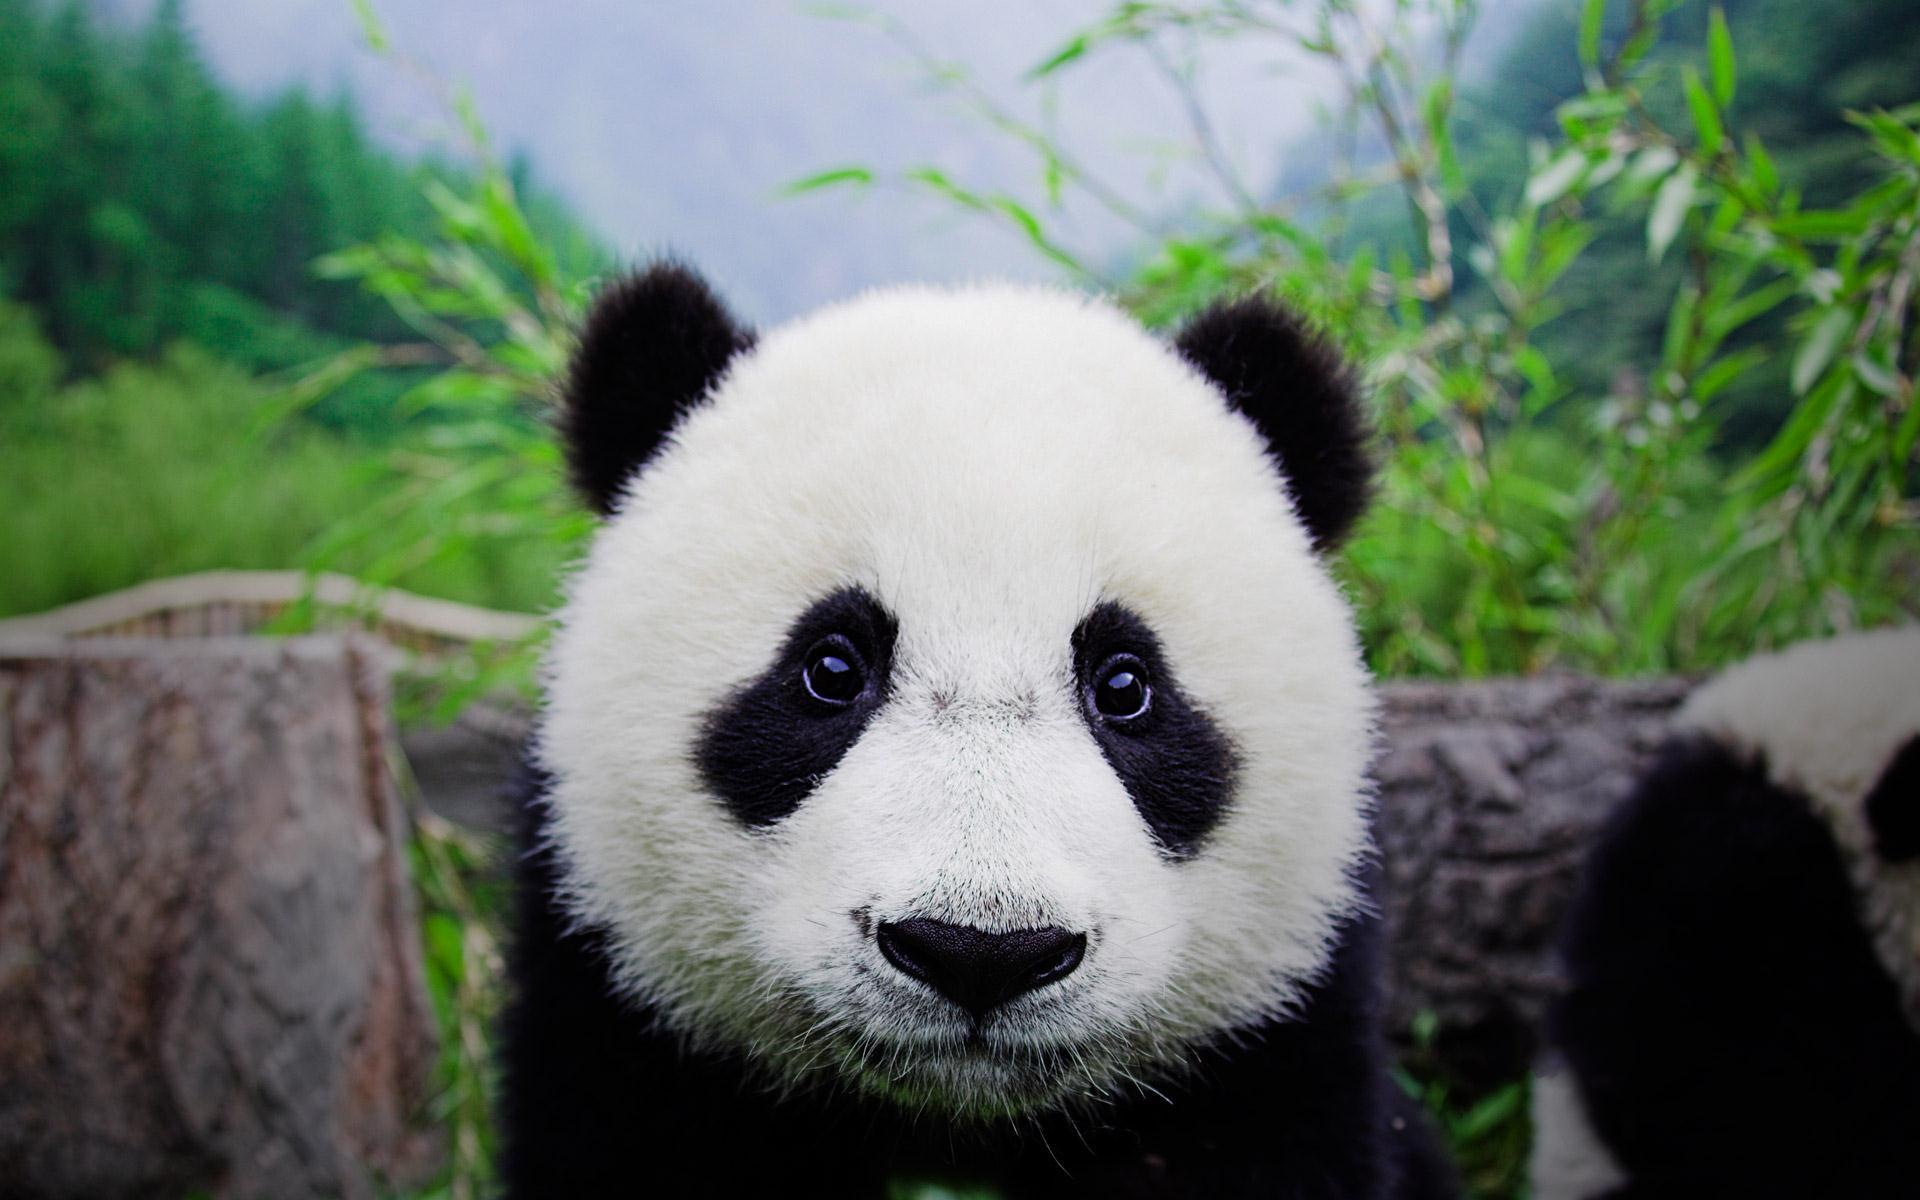 Panda Bear Desktop Wallpapers - HD Wallpapers Inn